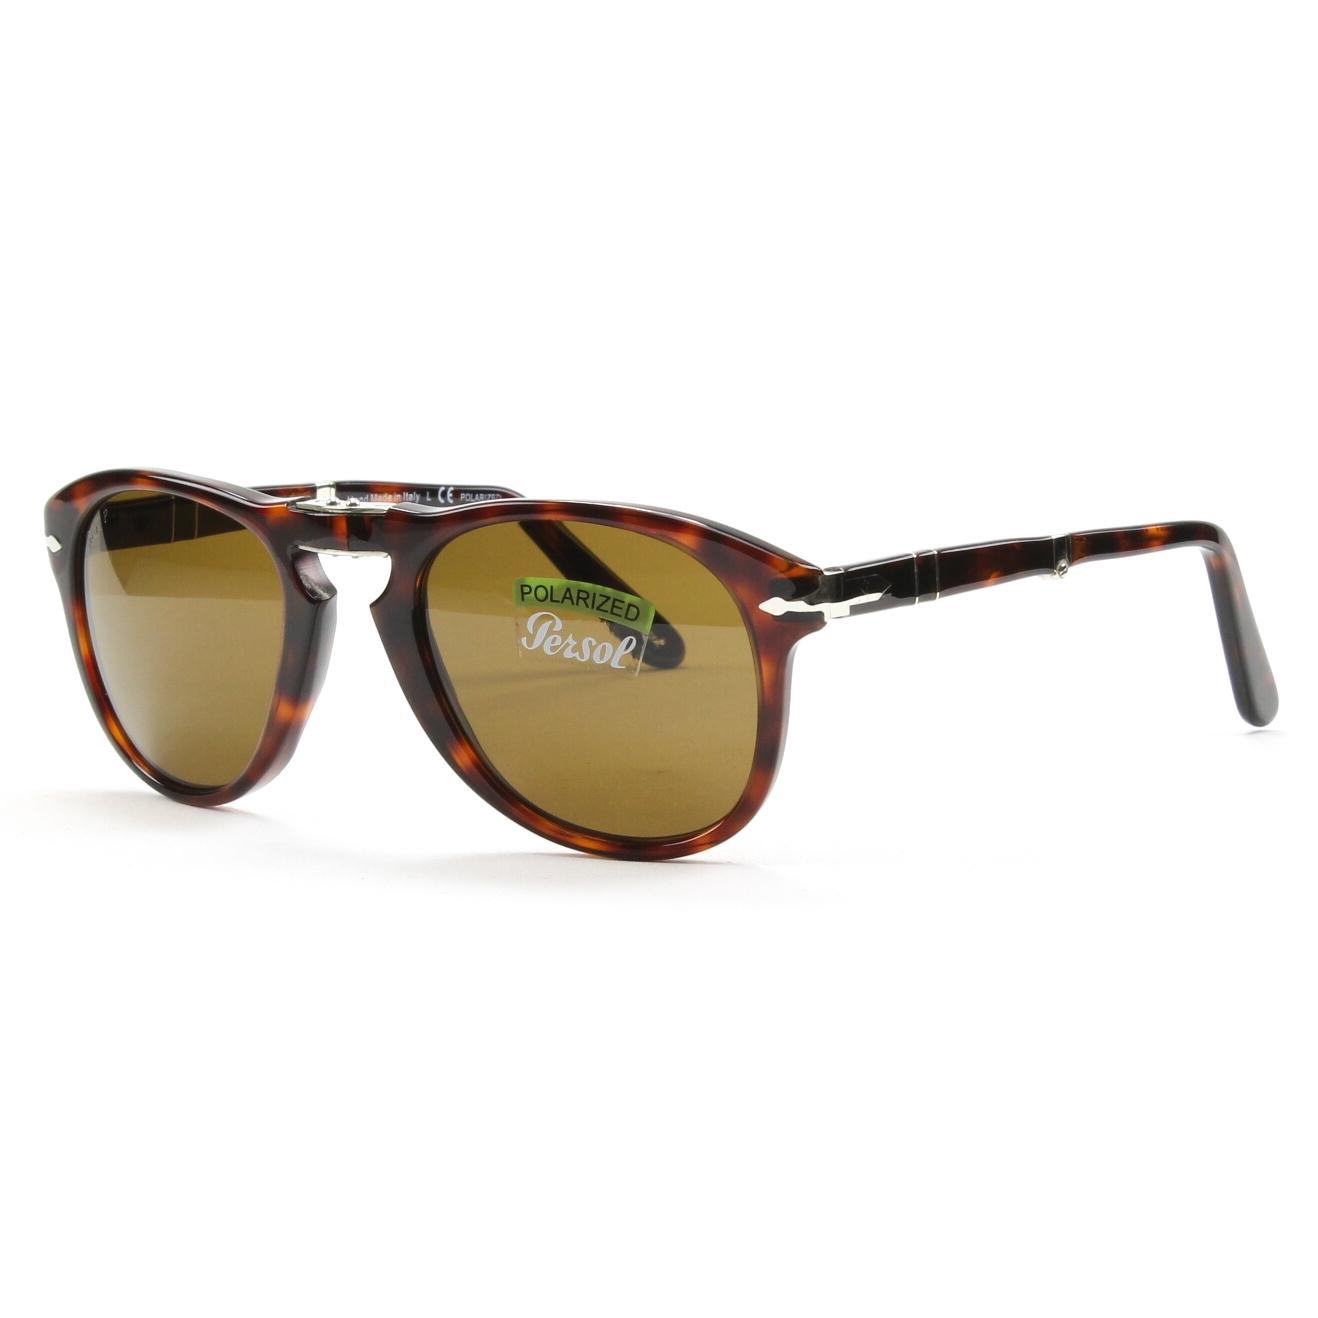 Persol 714 Folding Sunglasses 24/57 Havana, Brown Polarized Crystal Lenses 52mm | eBay